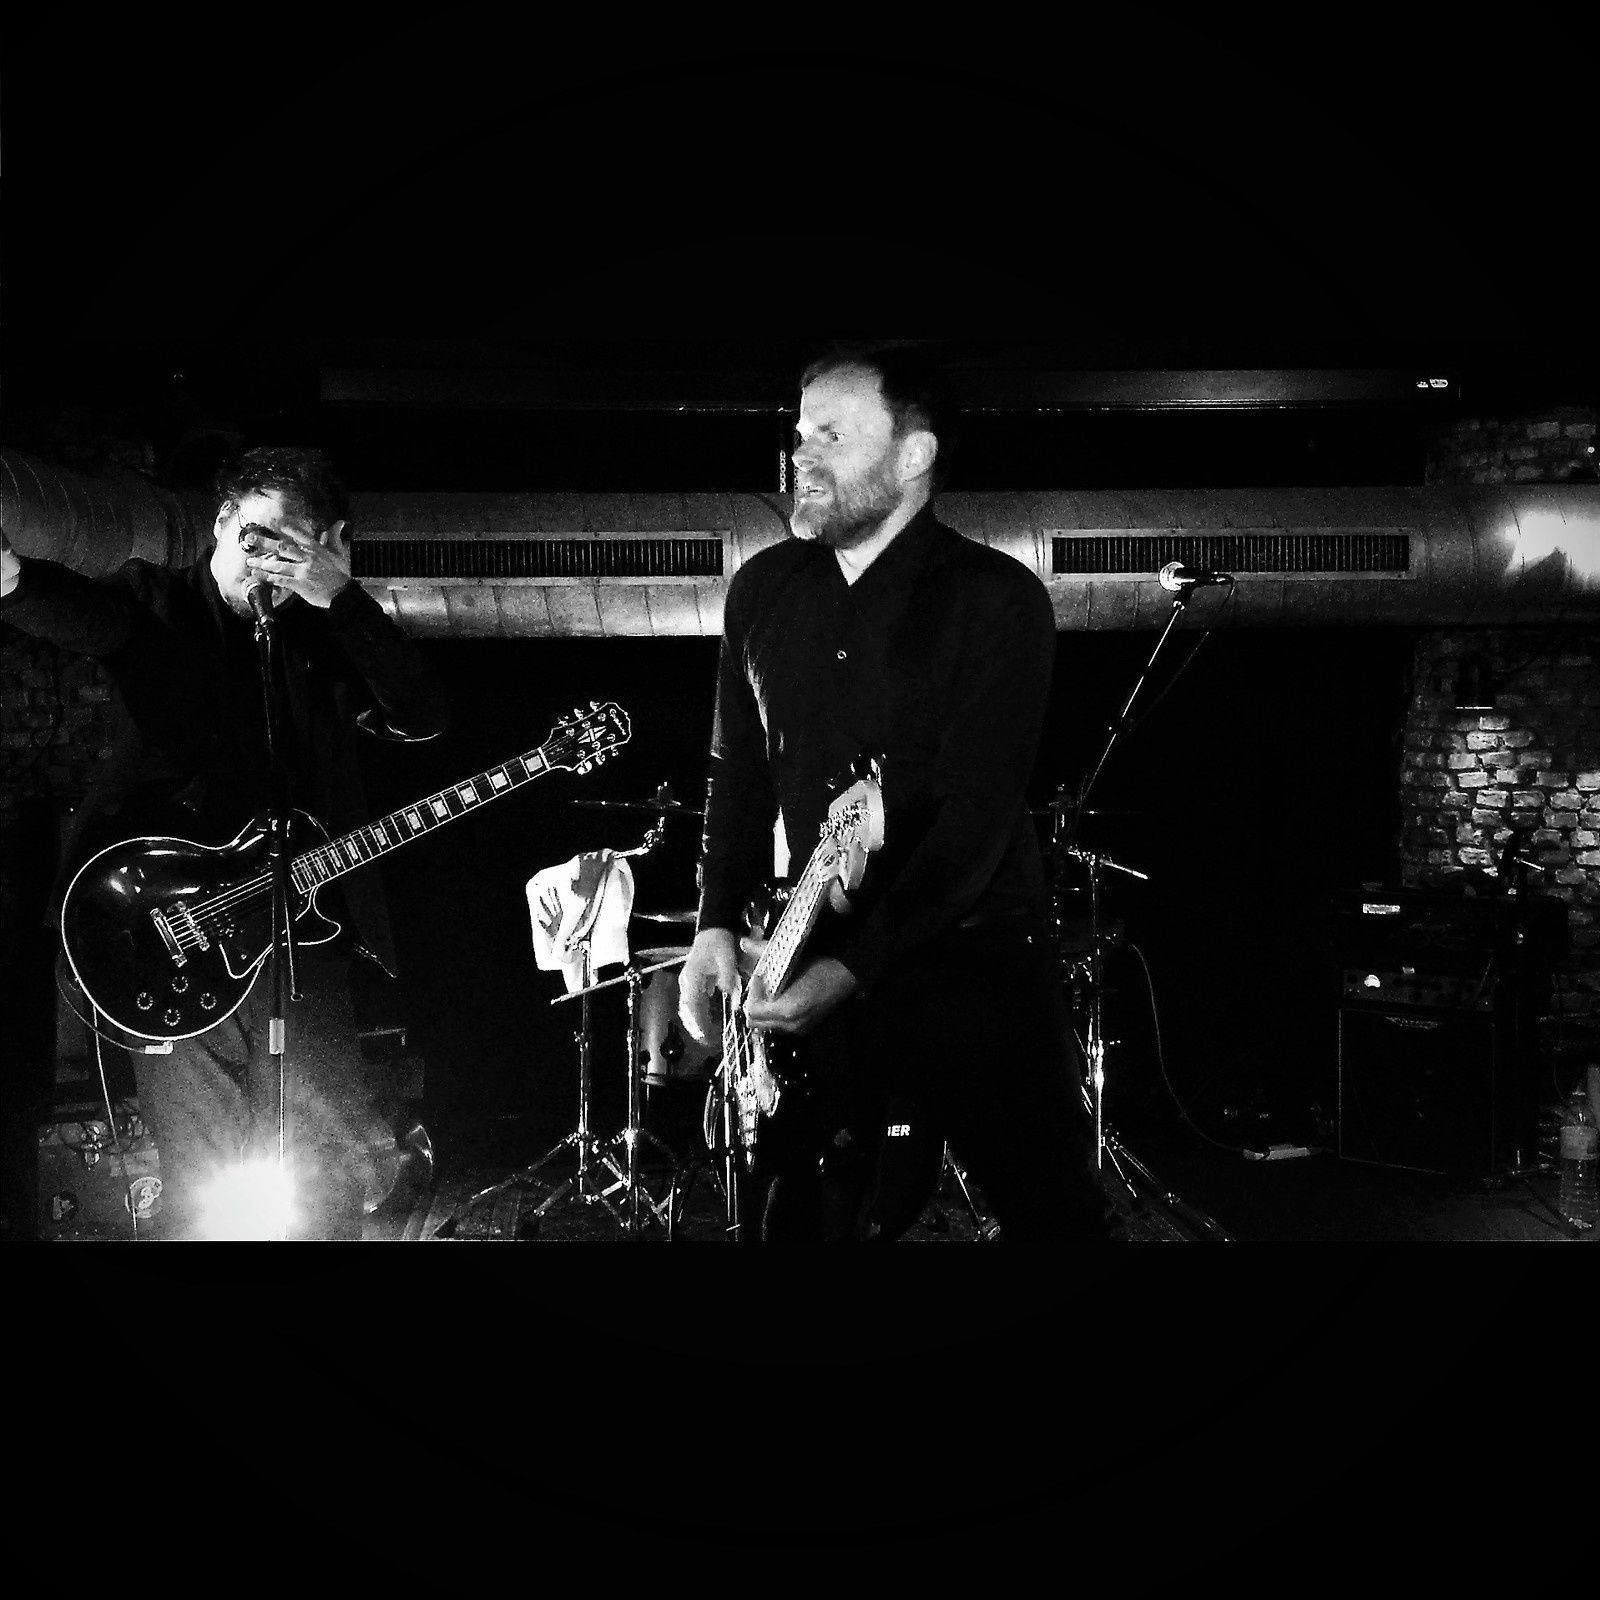 ▶ Photos / Videos - Luxury Stranger (Post-punk/Alternative Rock from UK) @ Rock Classic - 25/05/2019